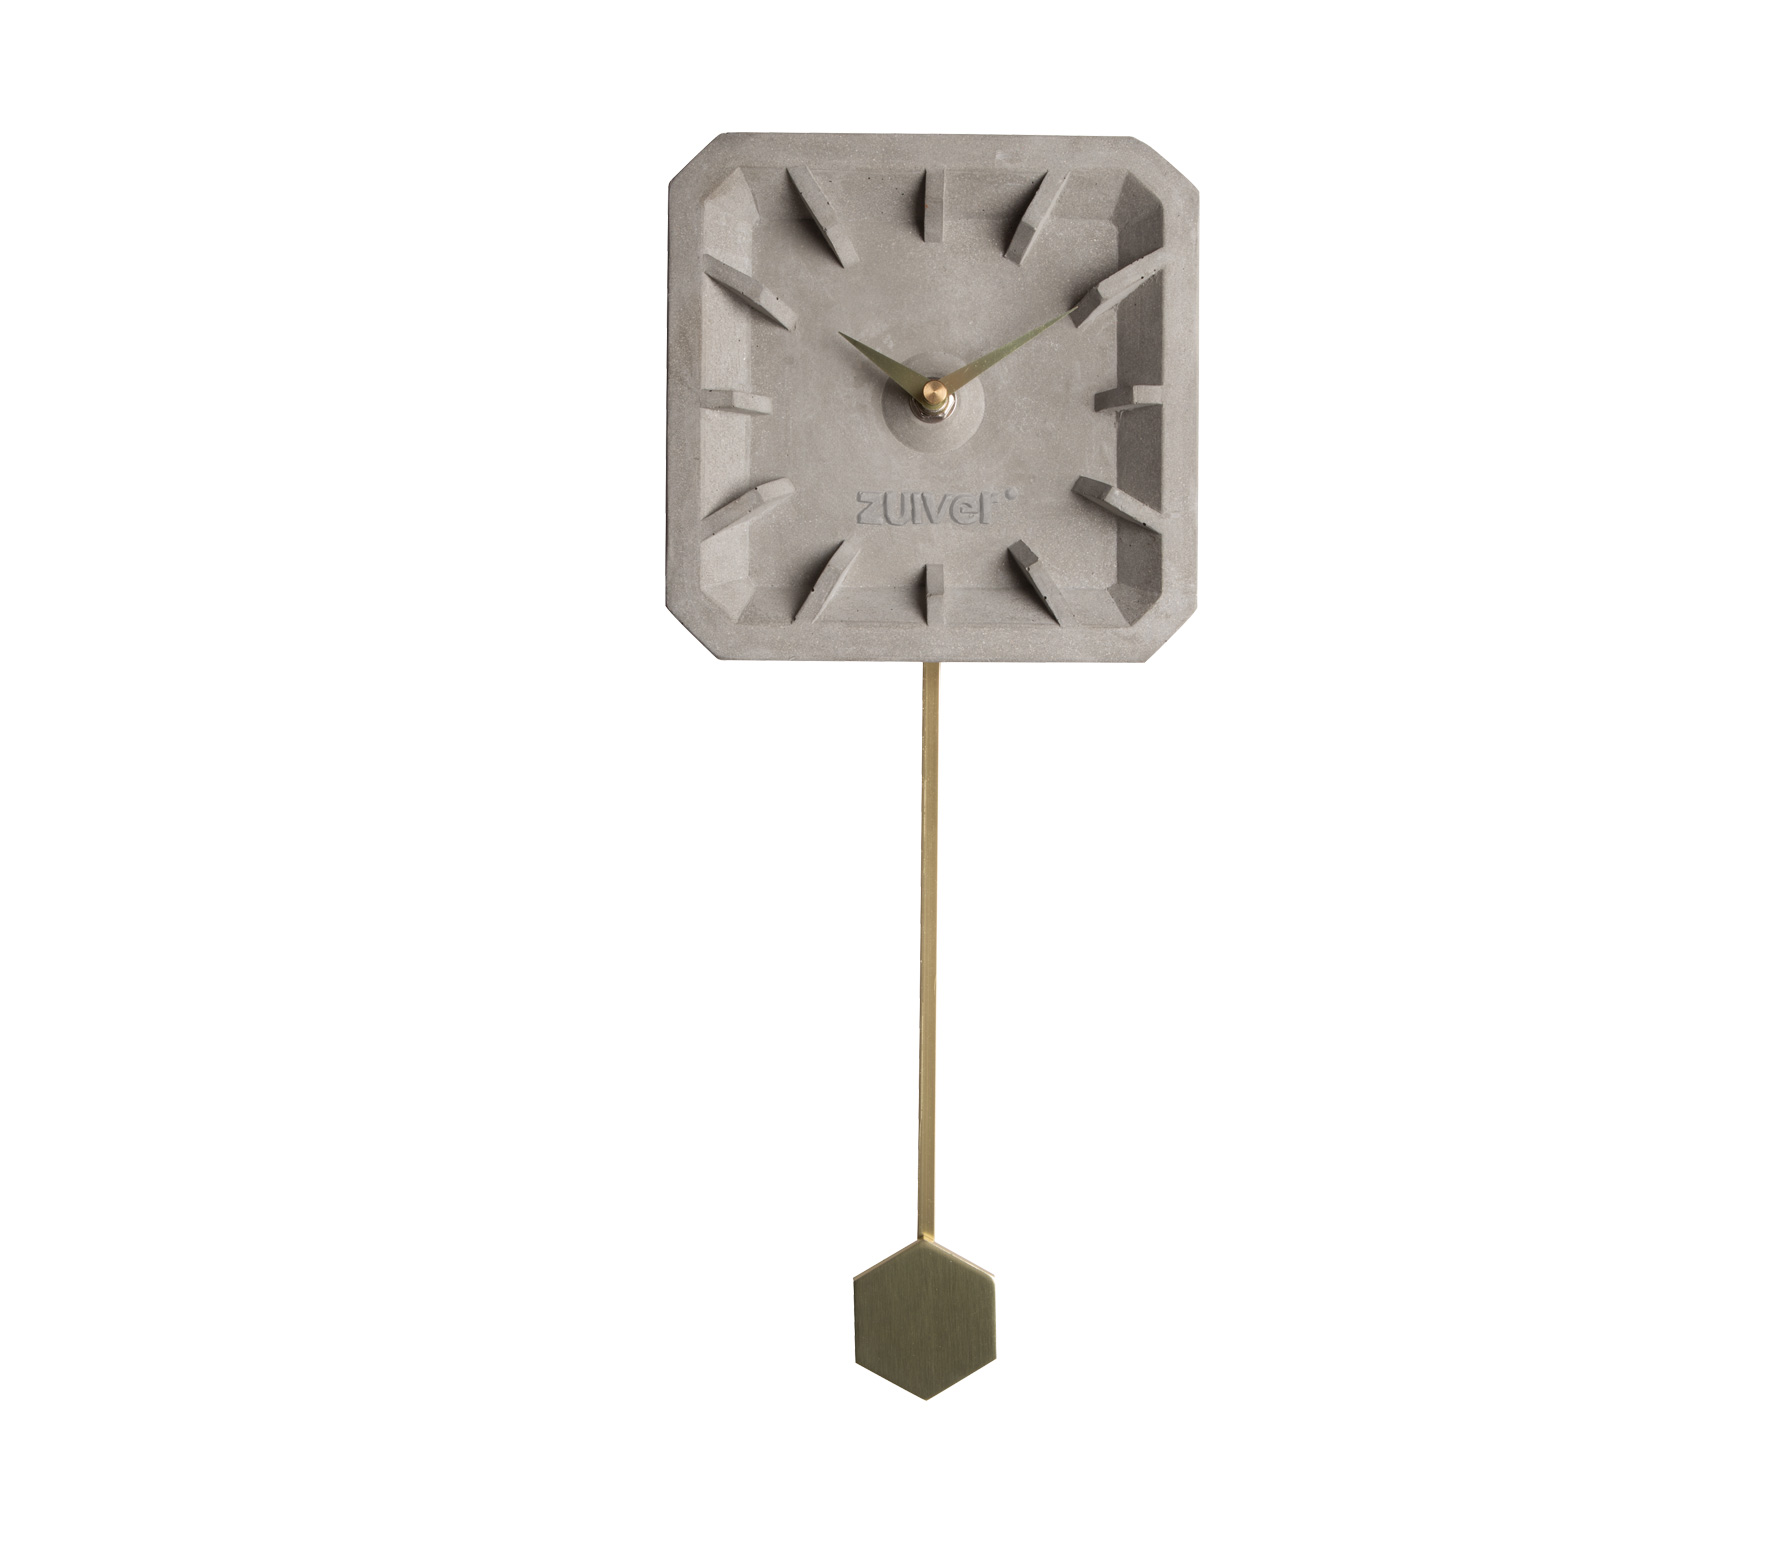 Zuiver TIKTAK wandklok beton met brass Beton icm brass